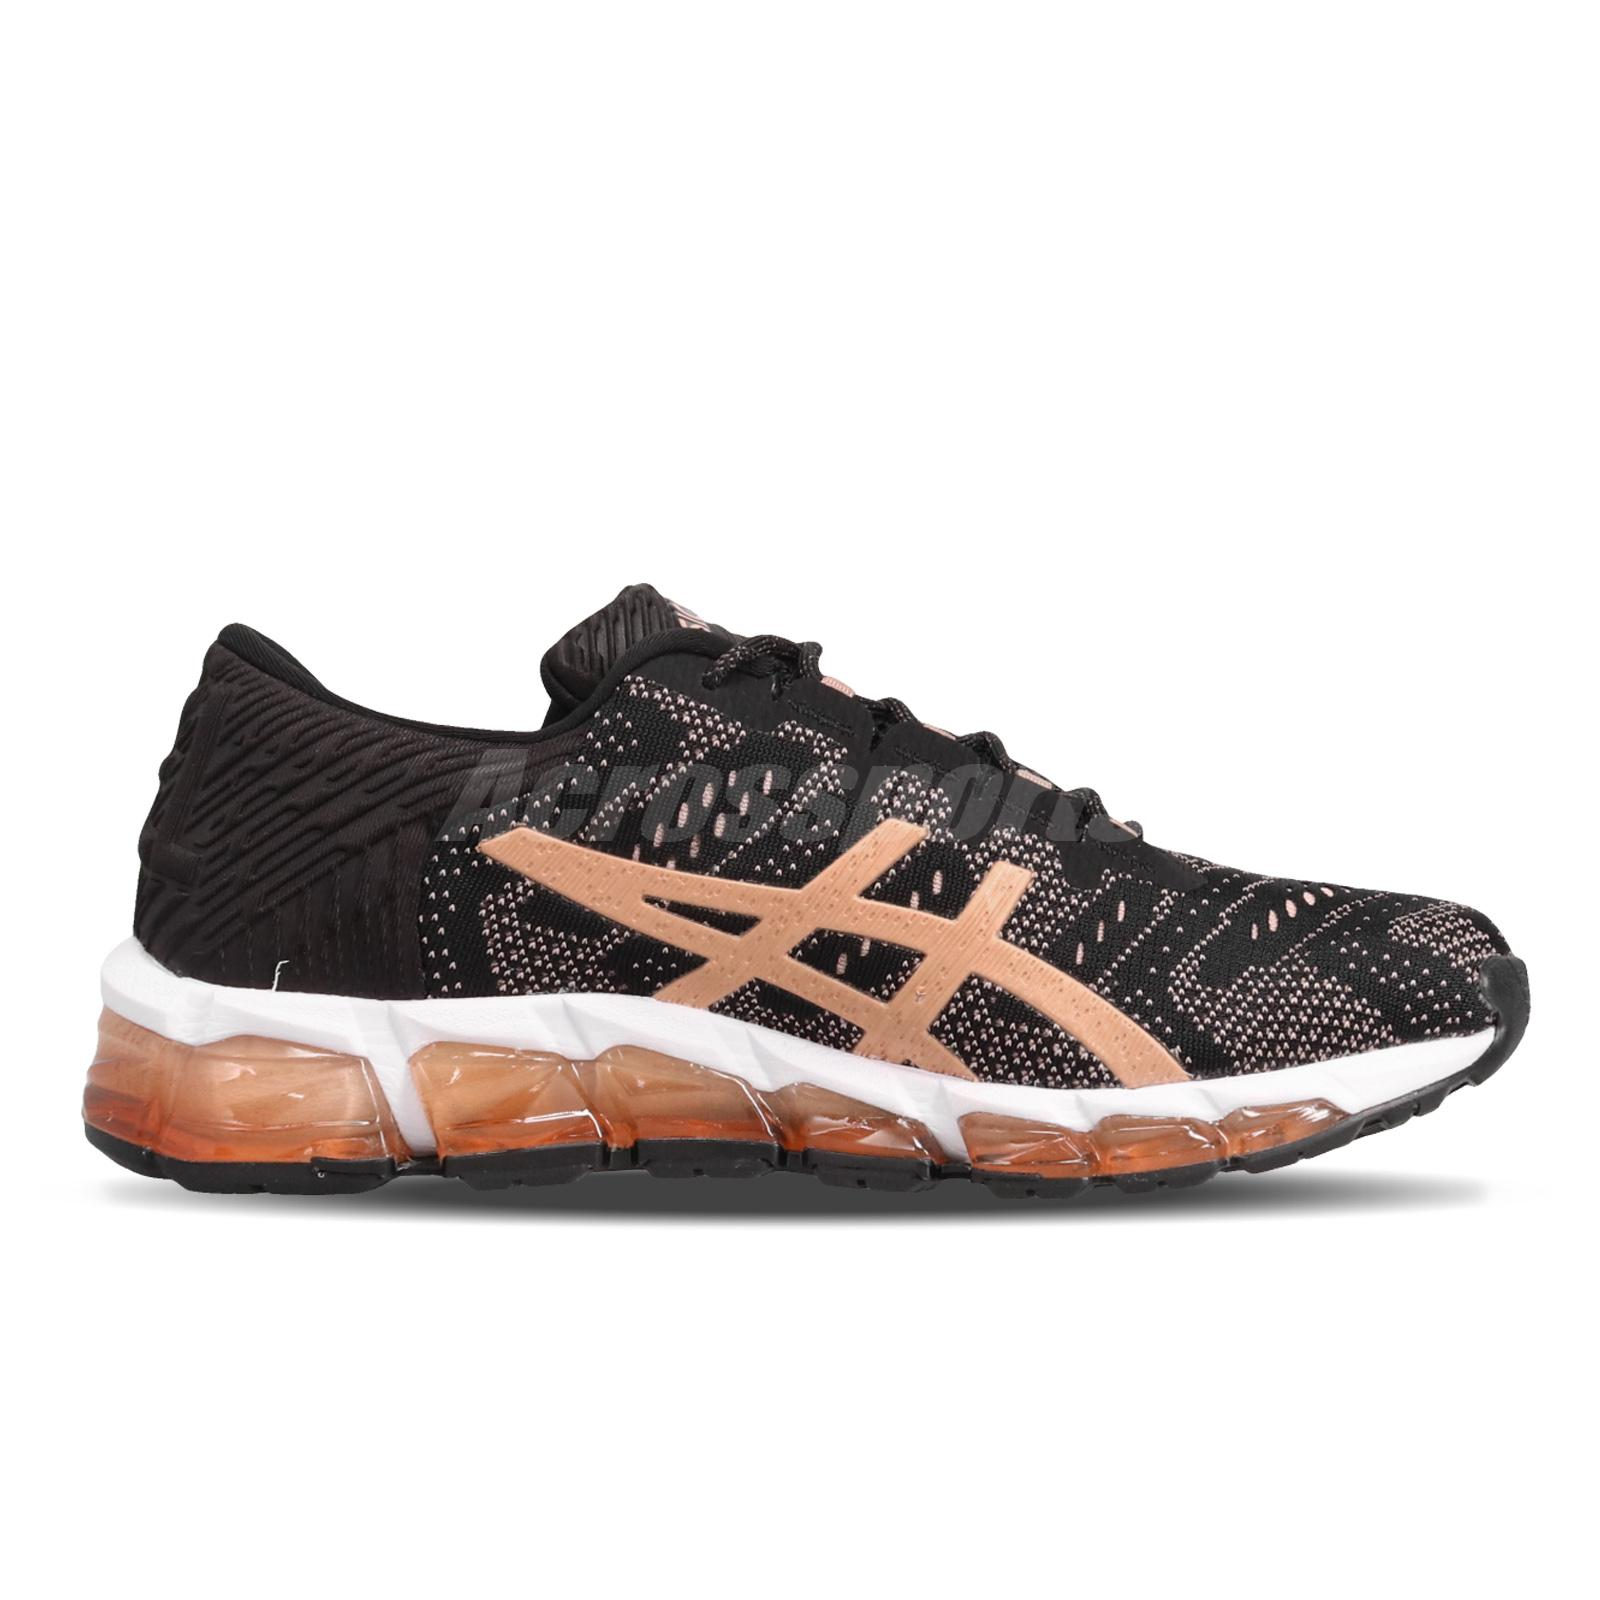 Asics Gel Quantum 360 5 Jcq Black Rose Gold Women Running Shoes 1022a132 002 Ebay